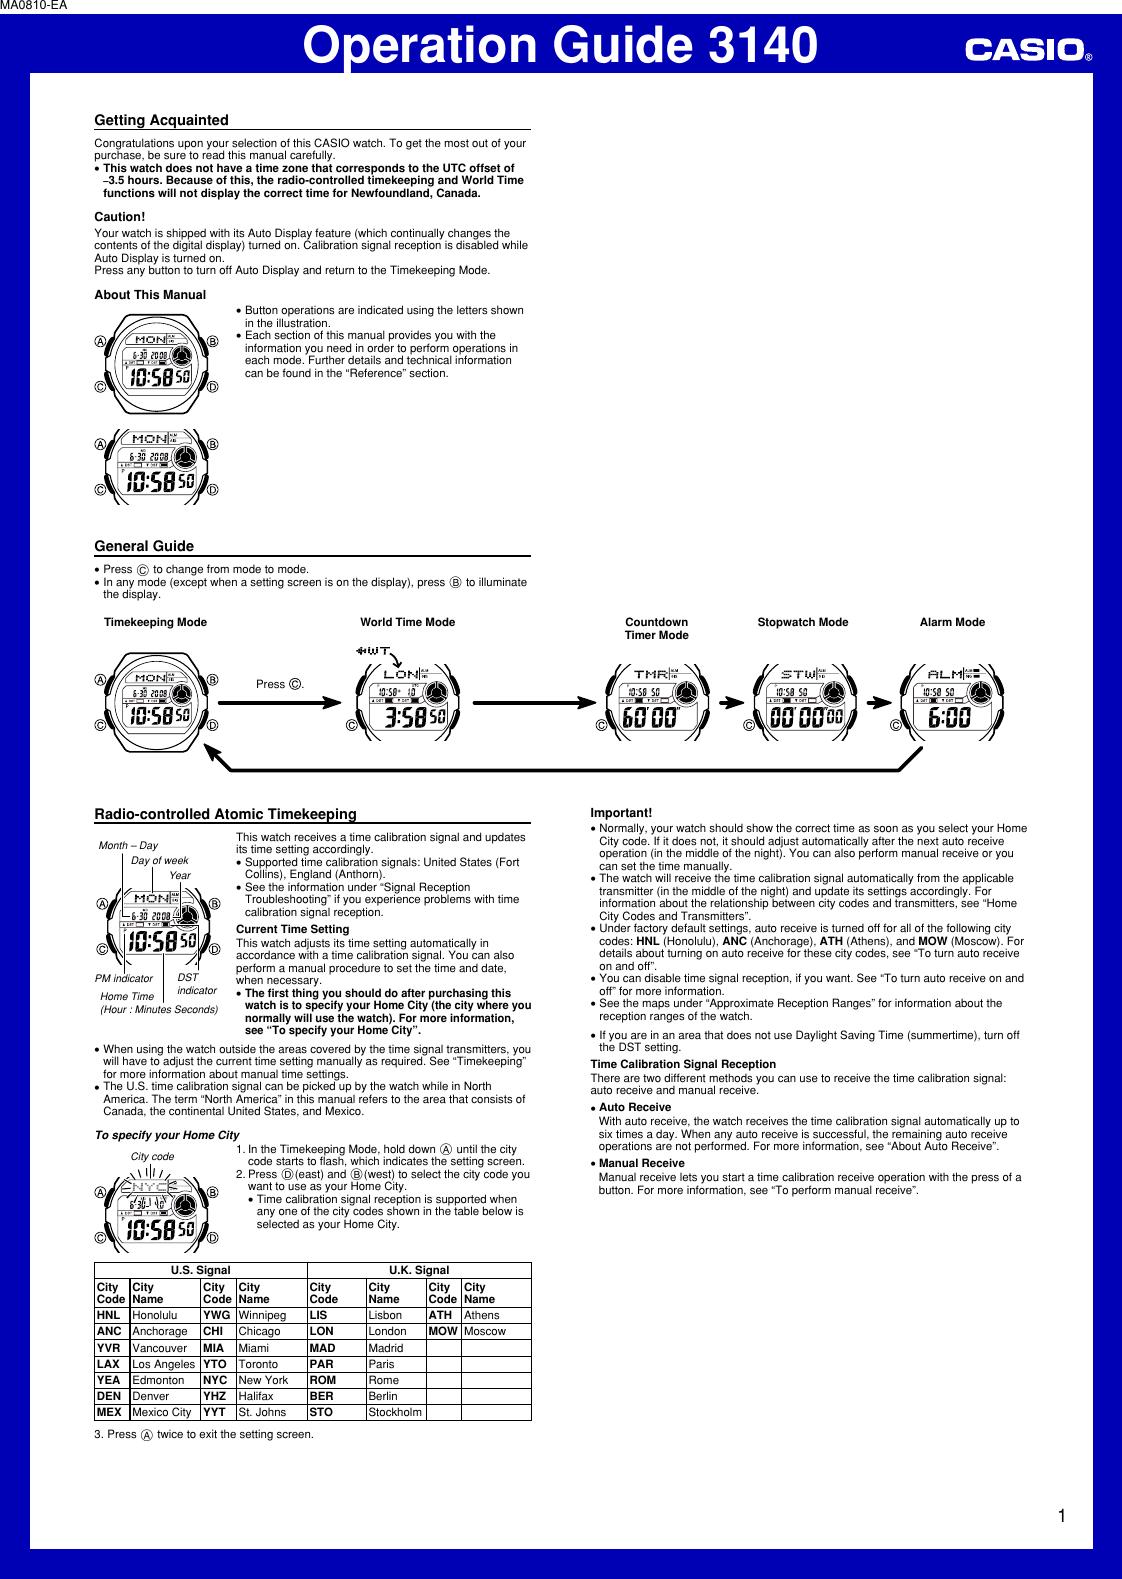 casio wave ceptor wv200a 1av wrist watch users manual qw 3140 rh usermanual wiki wave ceptor illuminator manual 3140 casio wave ceptor 3140 user manual